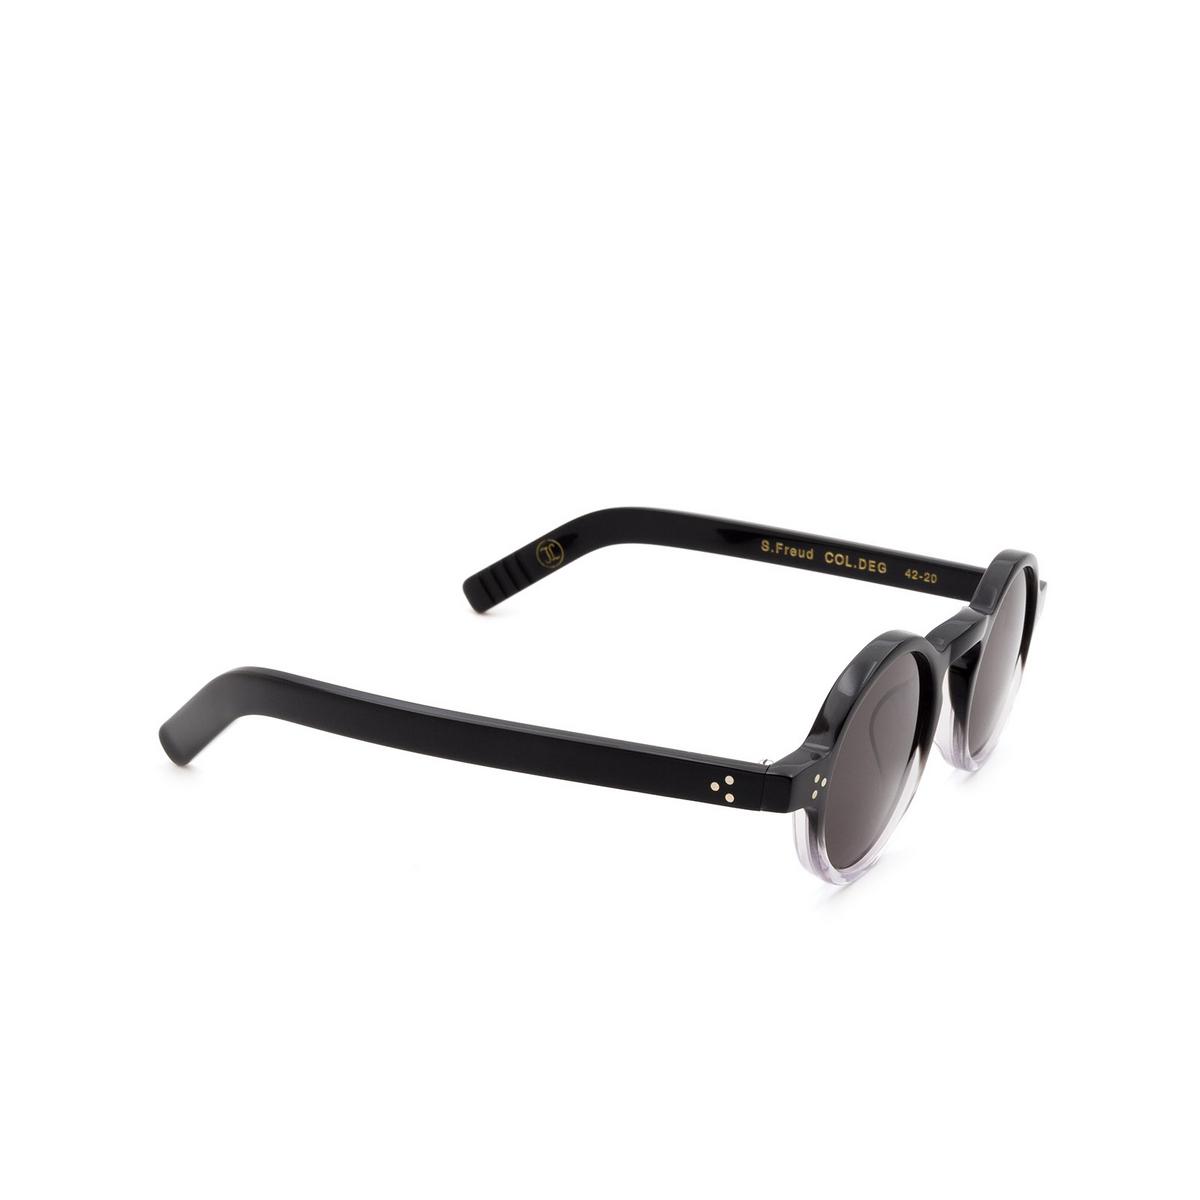 Lesca® Round Sunglasses: S.freud color Noir Degradé Deg - three-quarters view.